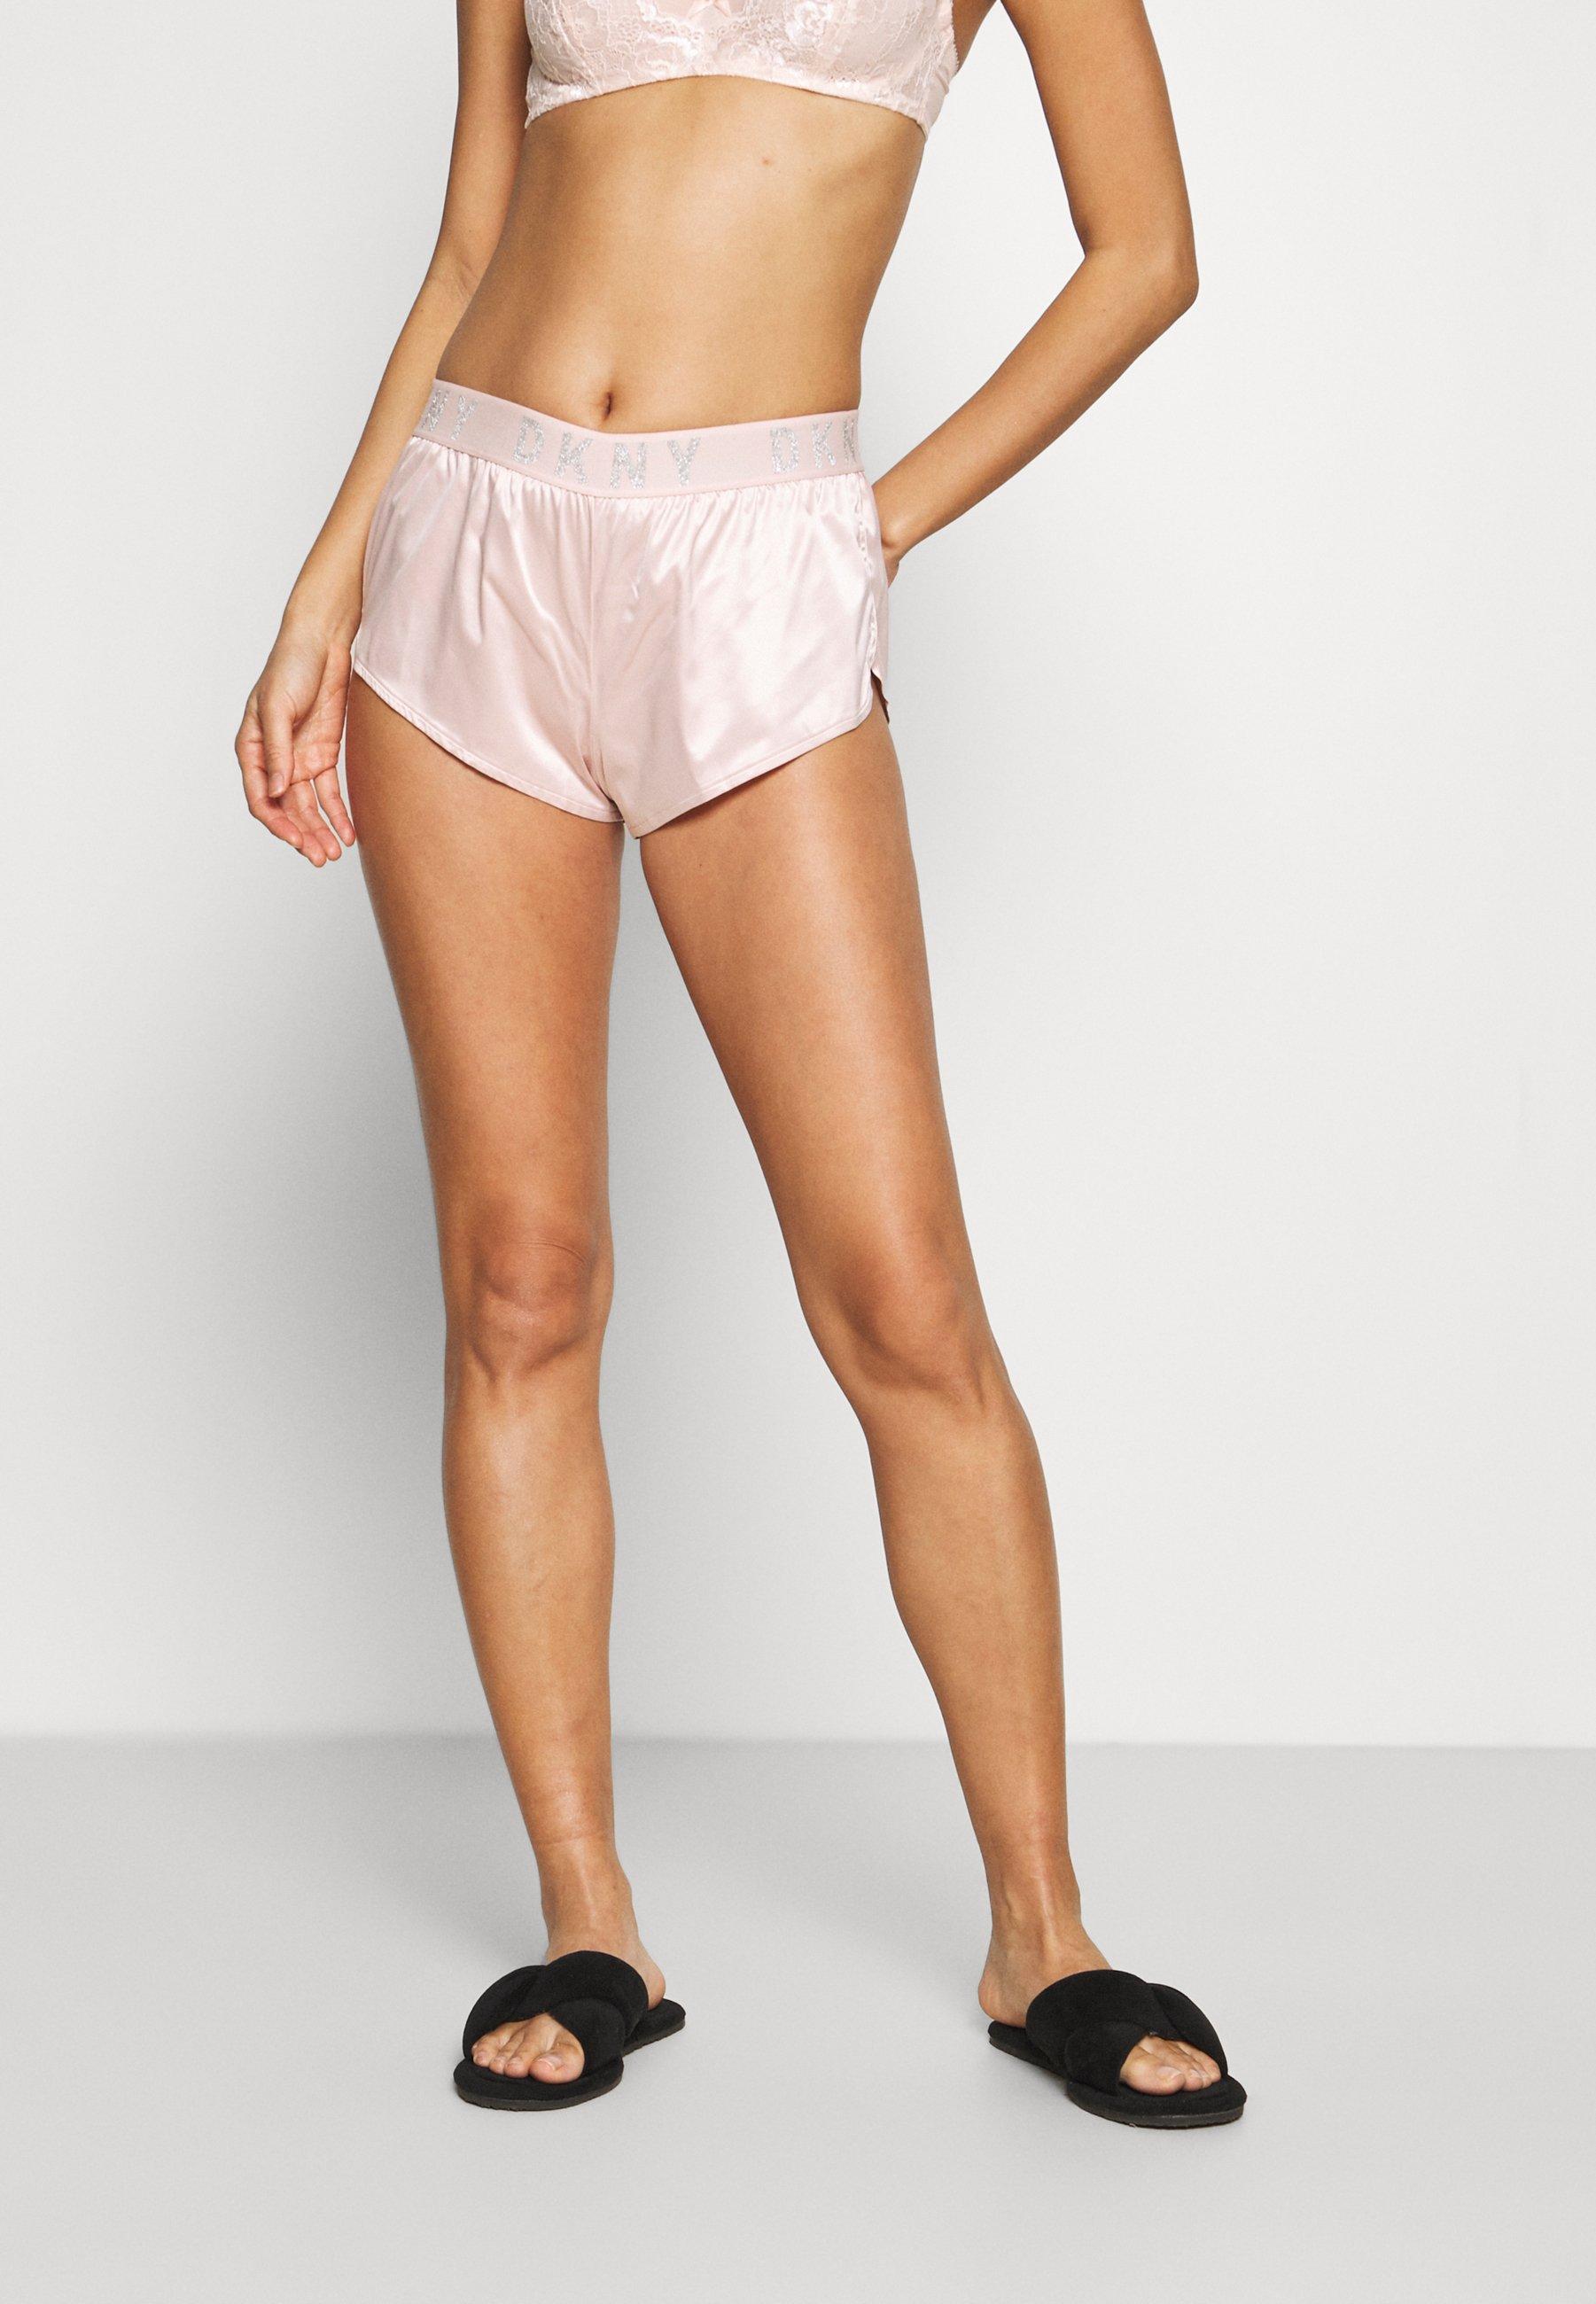 Damen TAP PANT - Nachtwäsche Hose